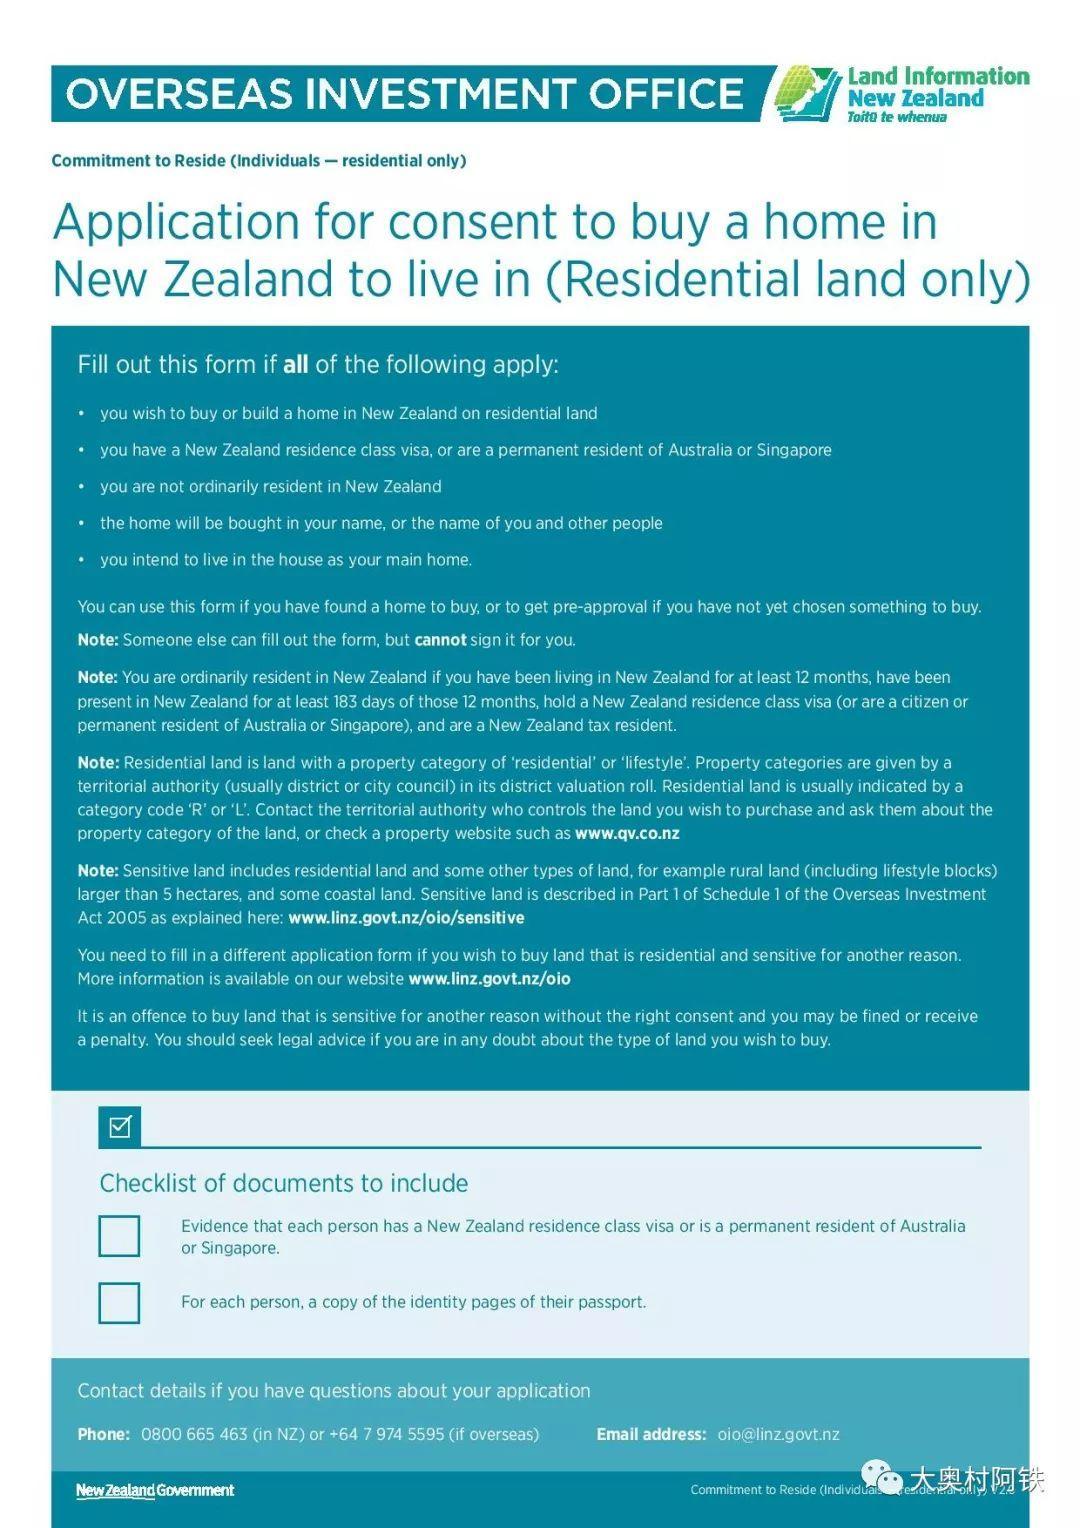 OIO你好, 我是新西兰PR, 想买房自住,但不够183天,怎么申请?